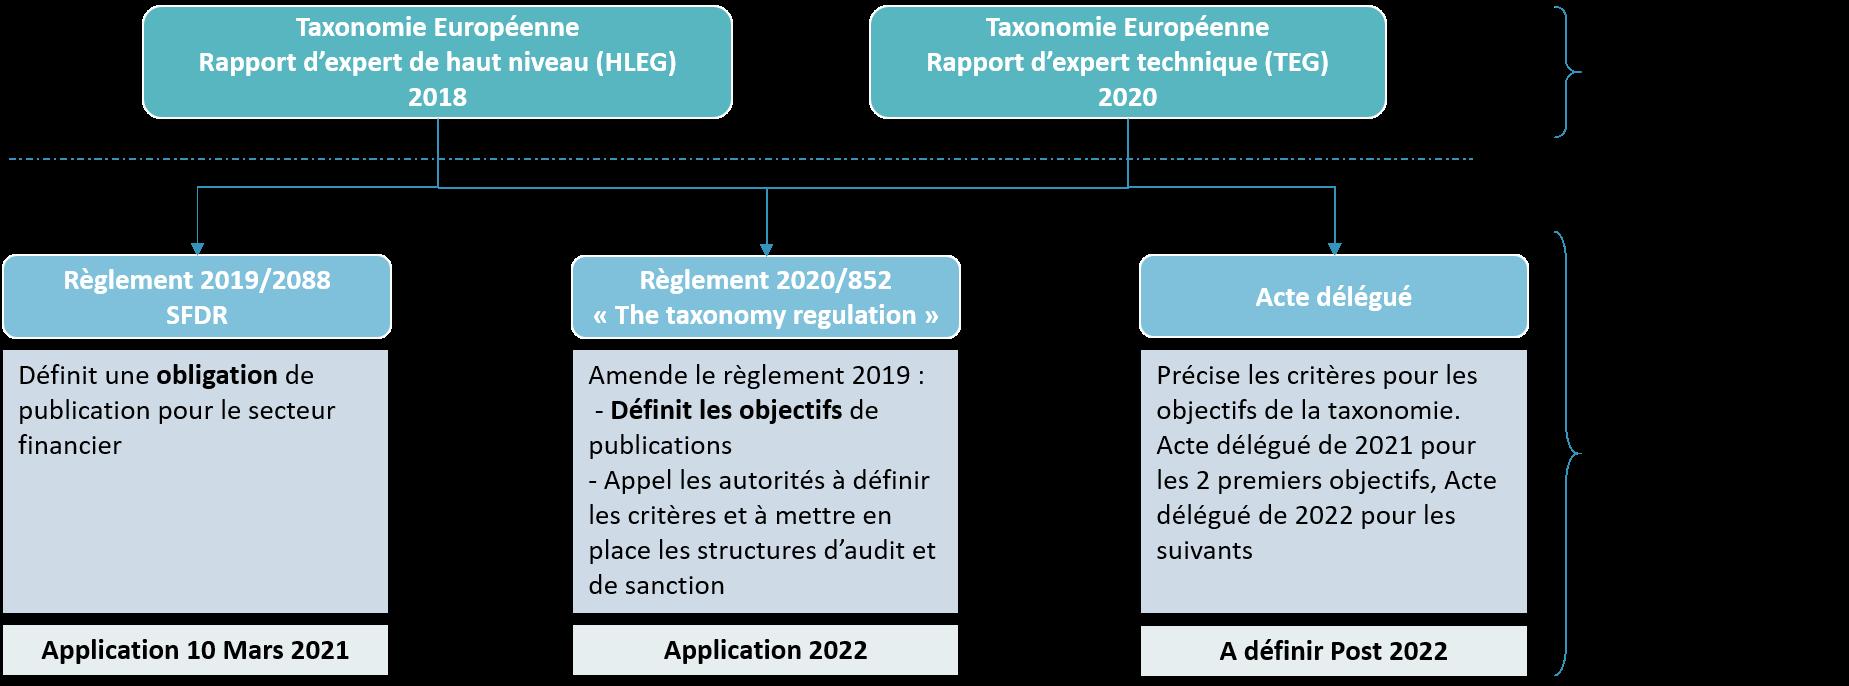 reglementation-taxonomie-verte